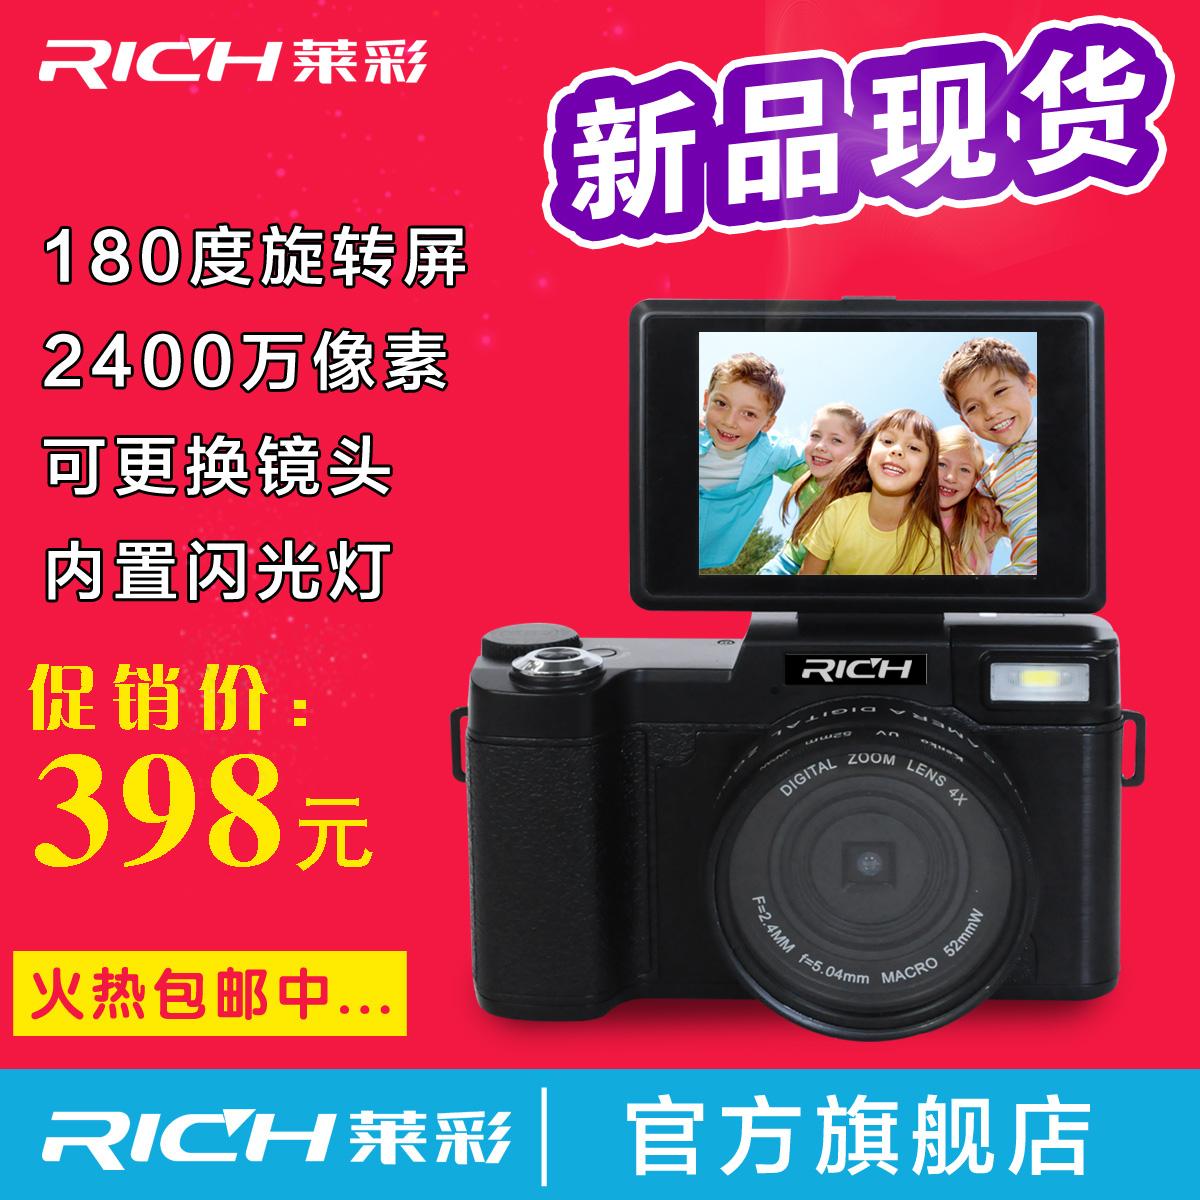 RICH/莱彩 数码相机2400万像素 16倍数码变焦 微单 自拍美颜相机